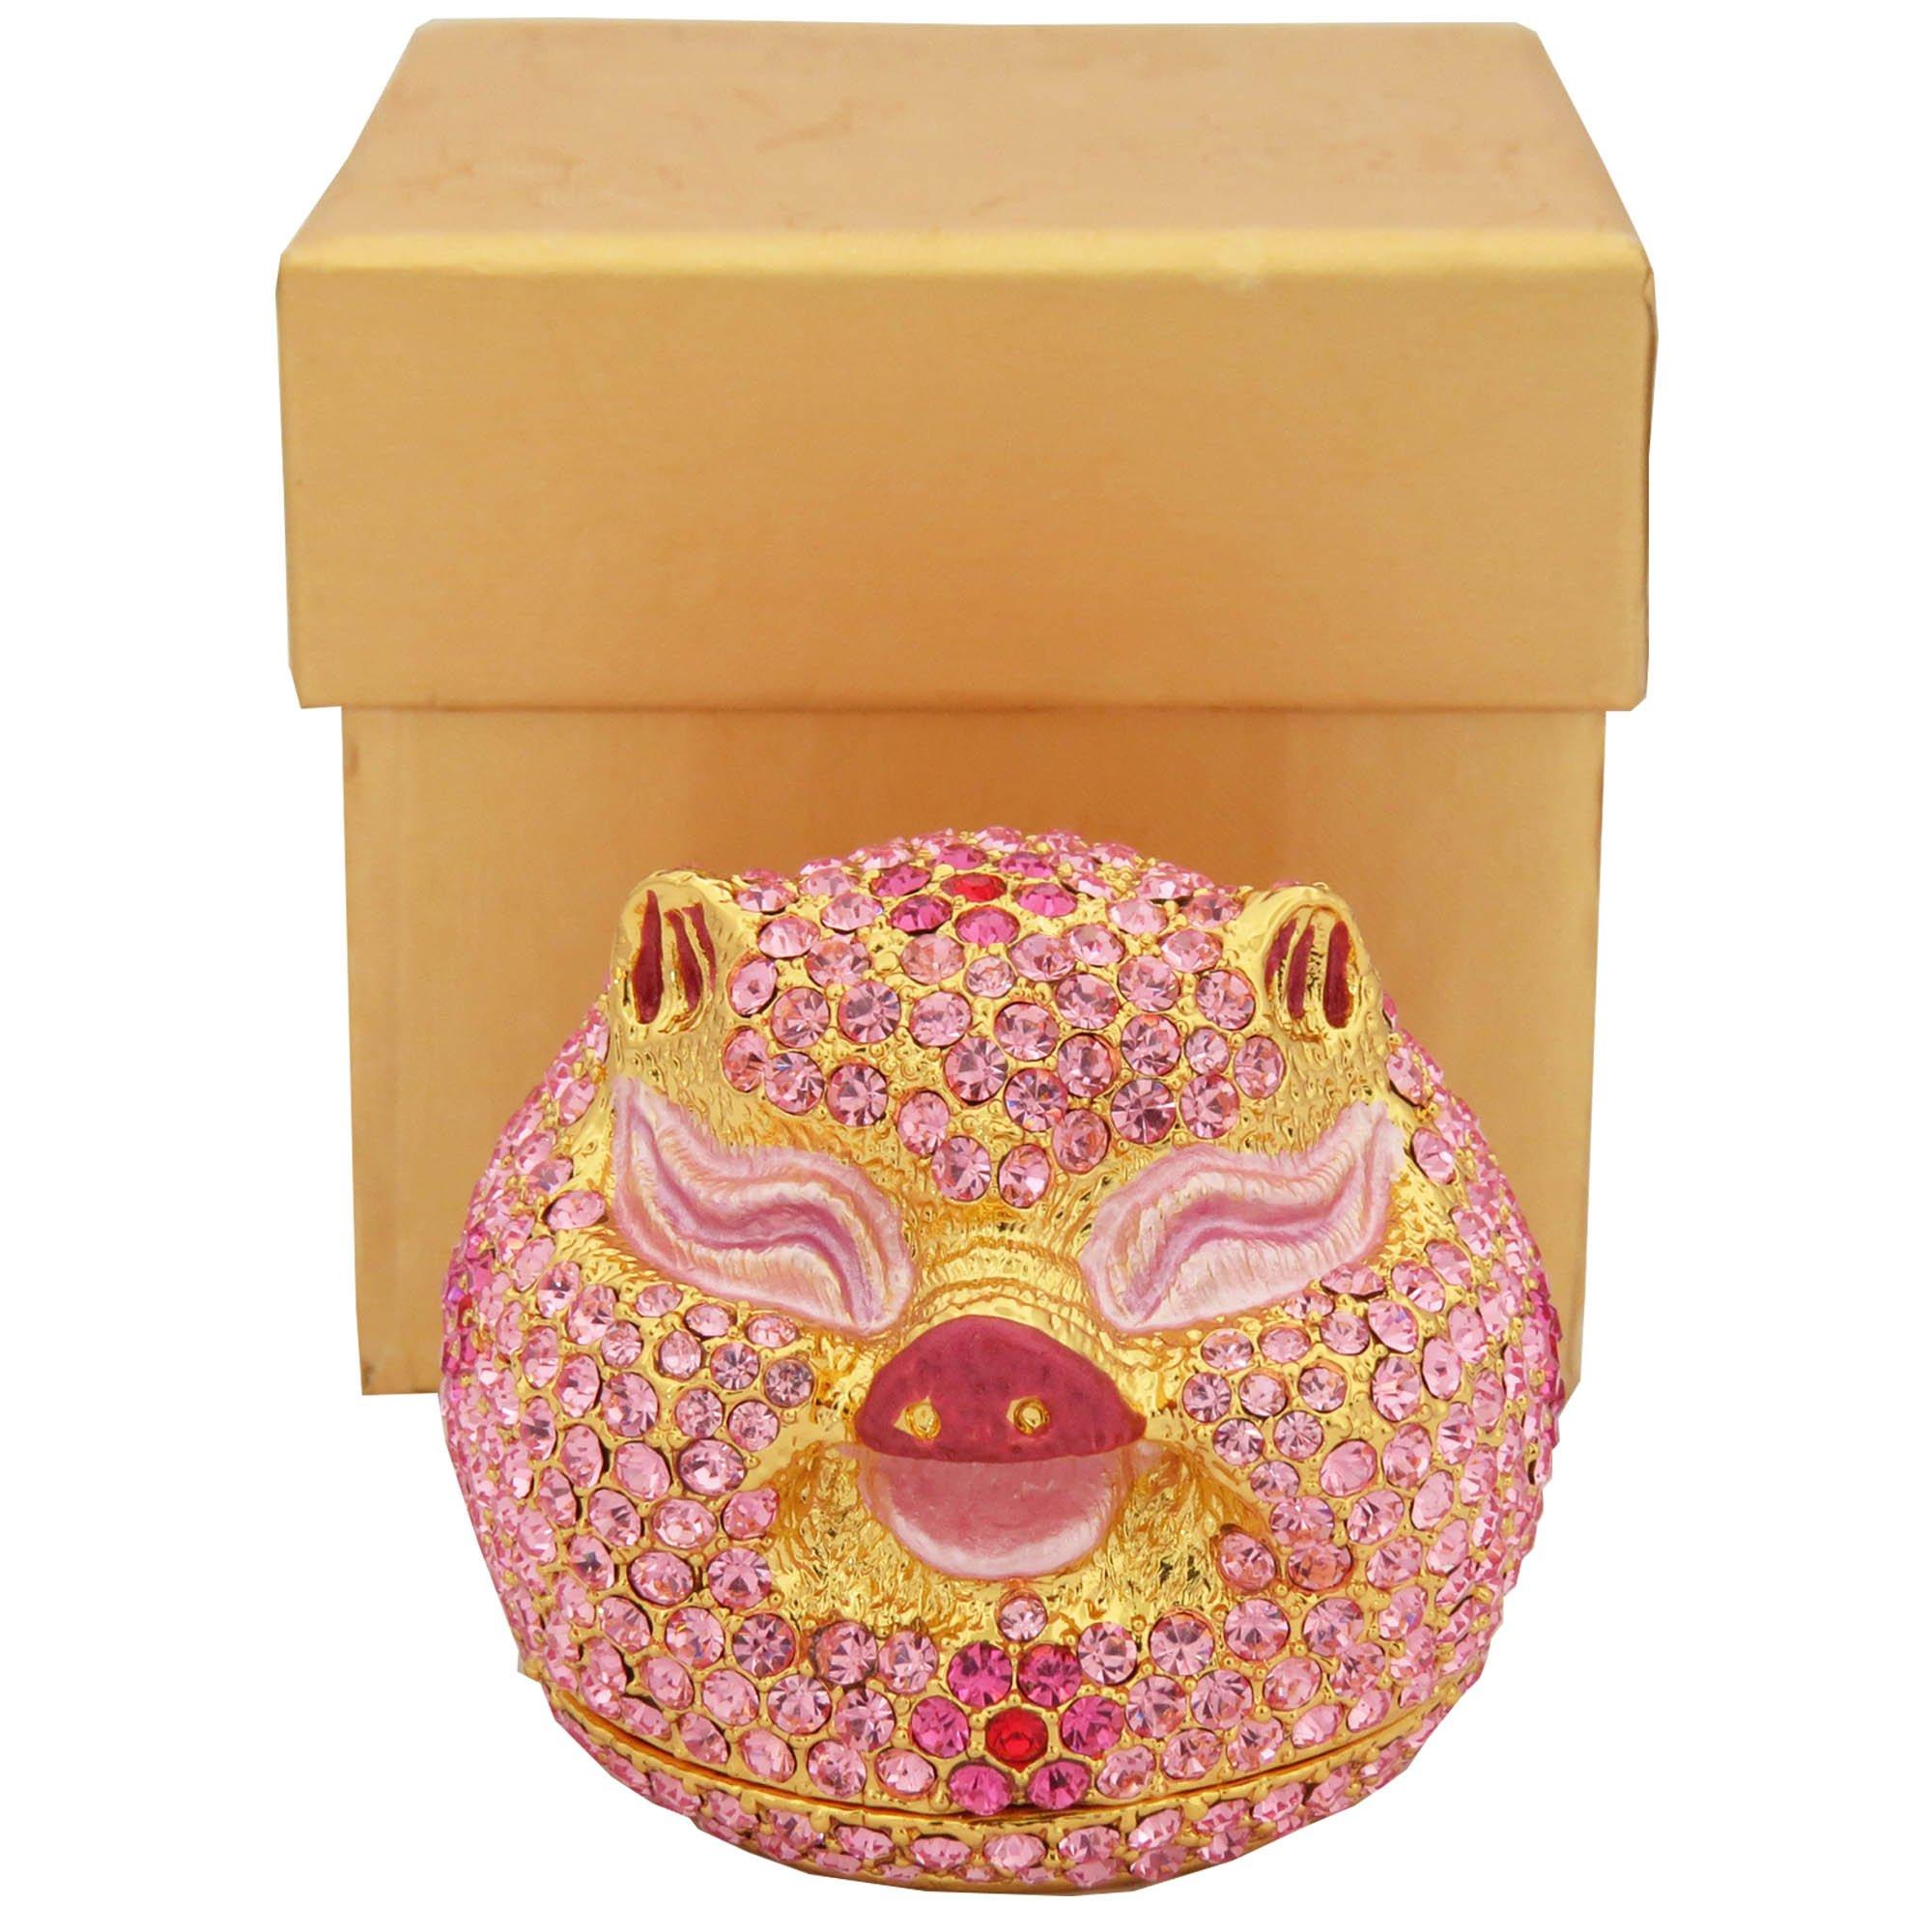 Blush Pink Enameled Pig Head Figurine Trinket Jewelry Box With Swarovski Elements Crystals by Krustallos